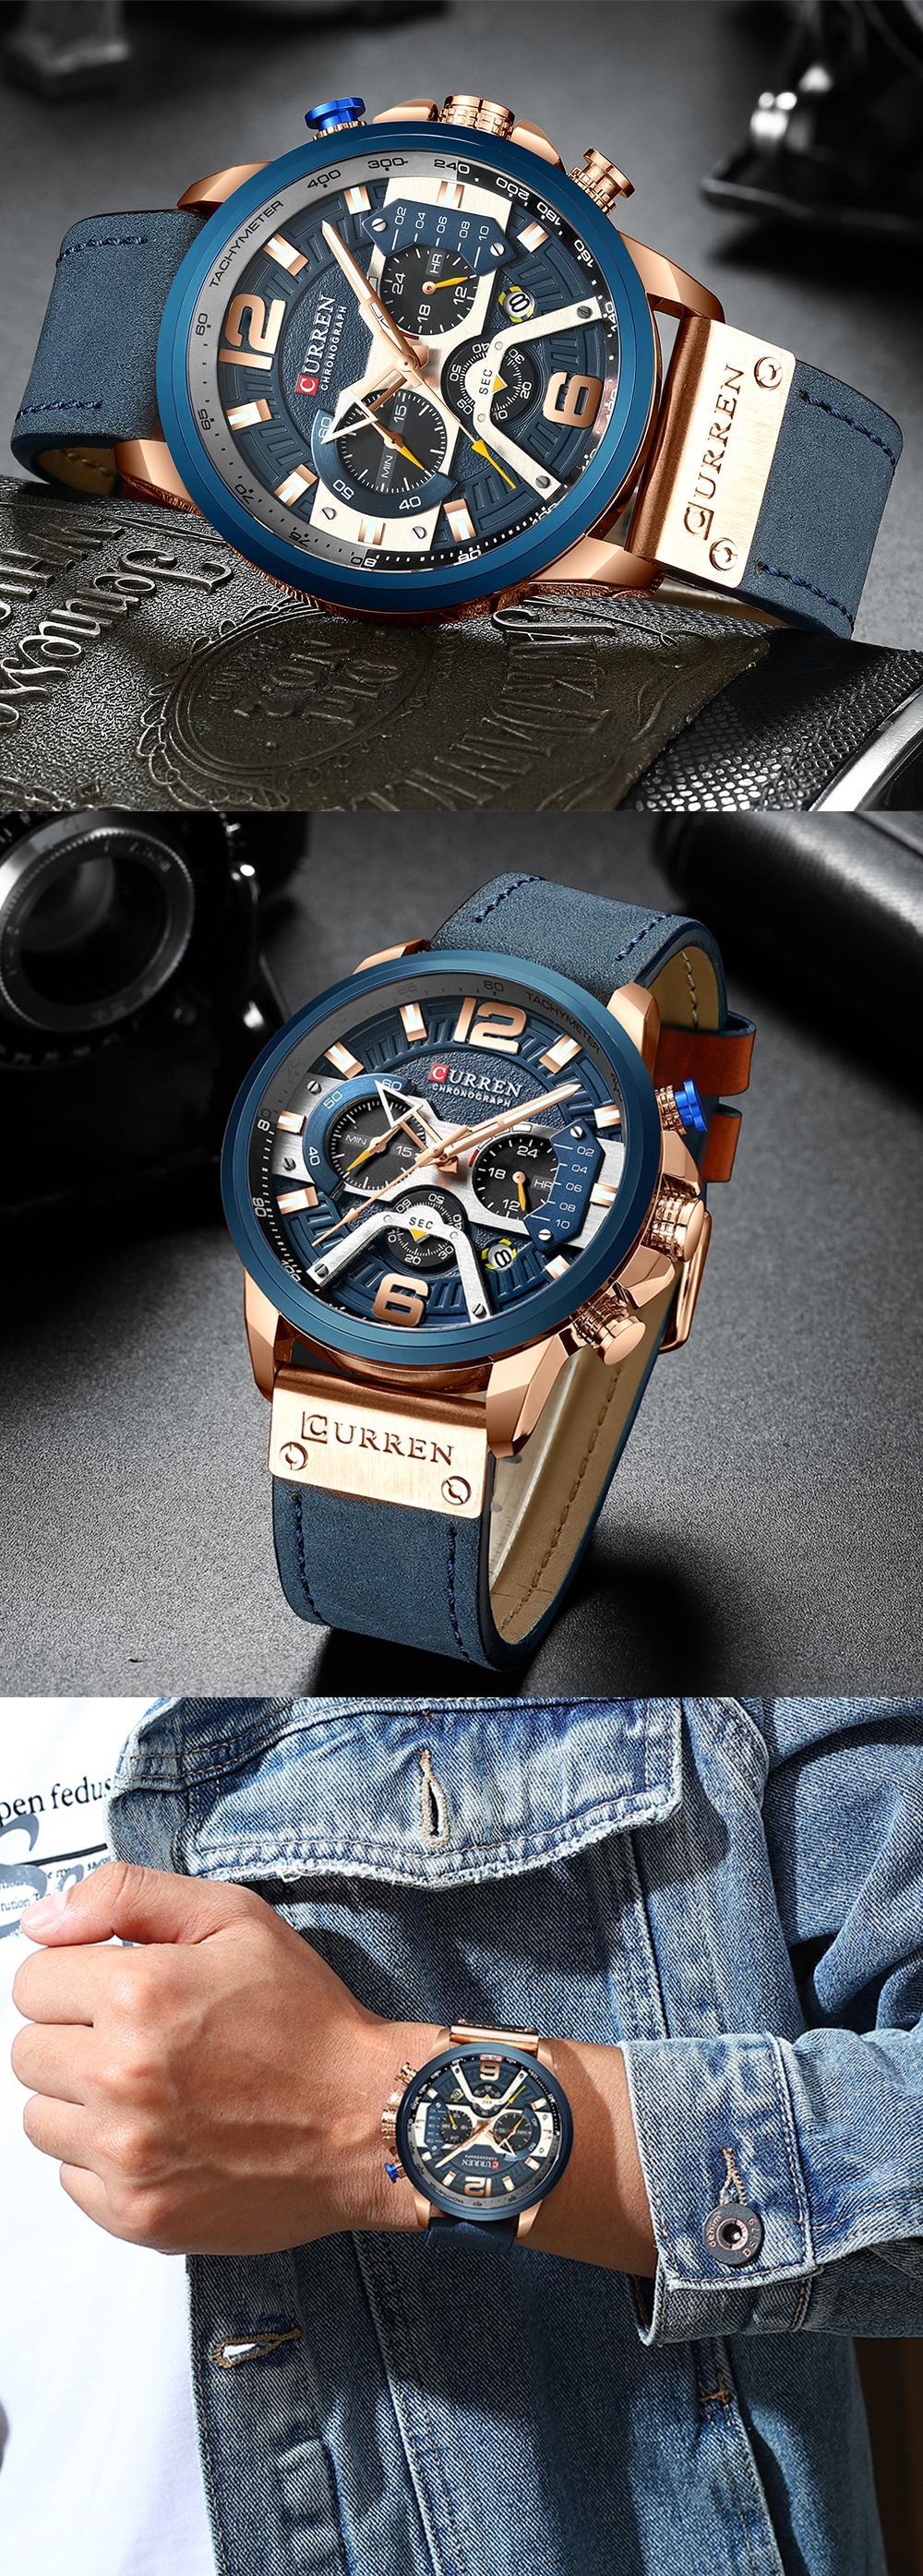 CURREN Relogio Masculino Sport Watch Men Top Brand Luxury Quartz Men's Chronograph Date Military Wrist Watches Waterproof 8329